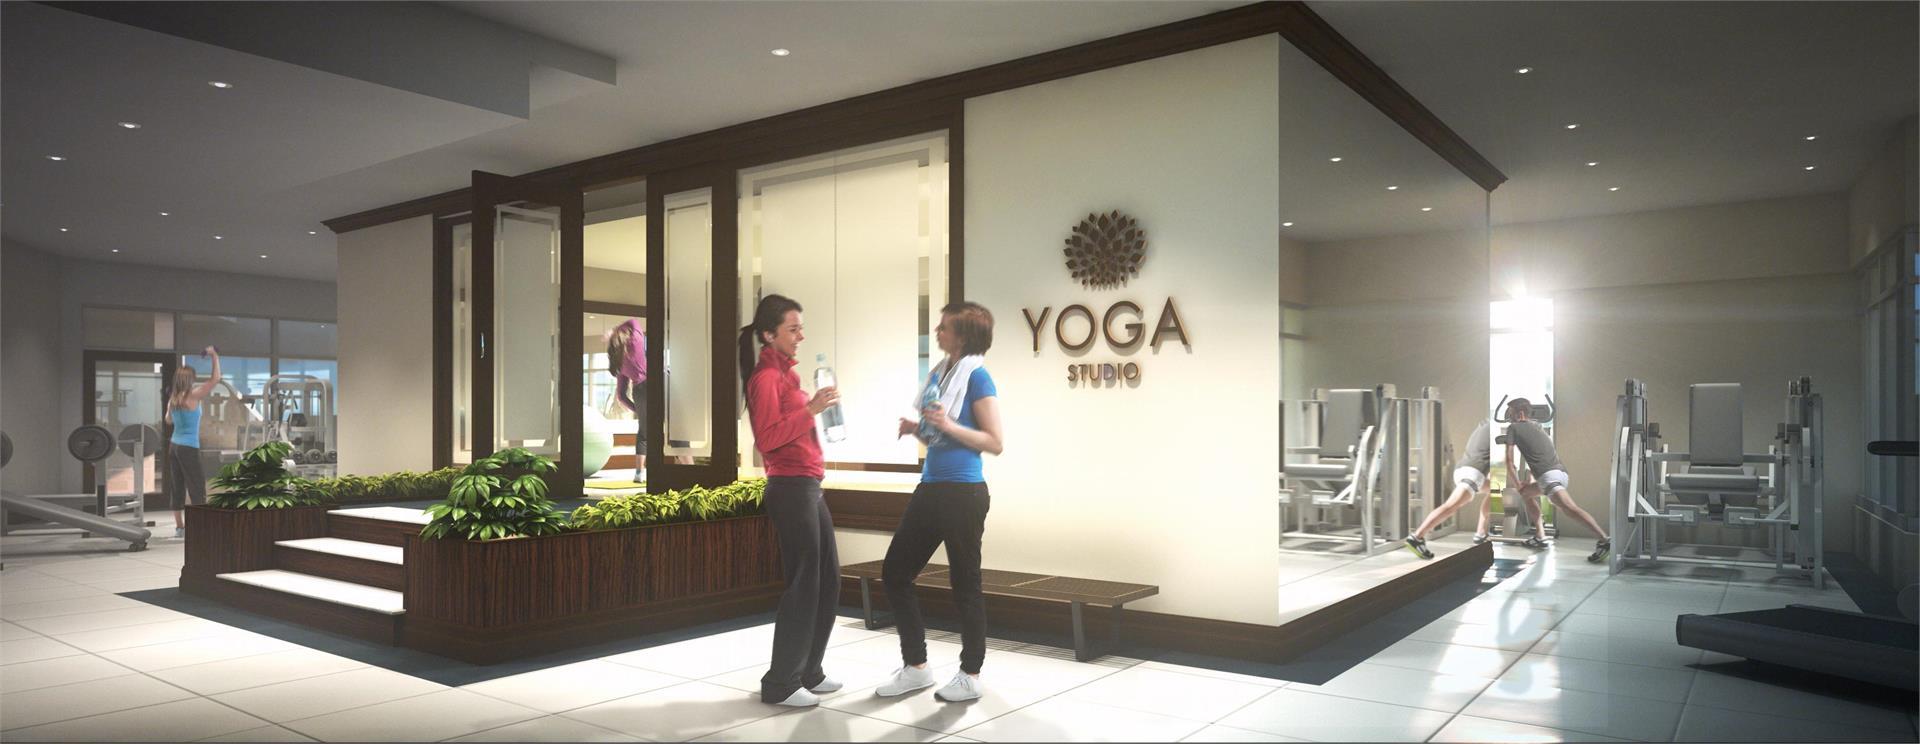 Rendering of Upper Vista Condos fitness centre with yoga studio.